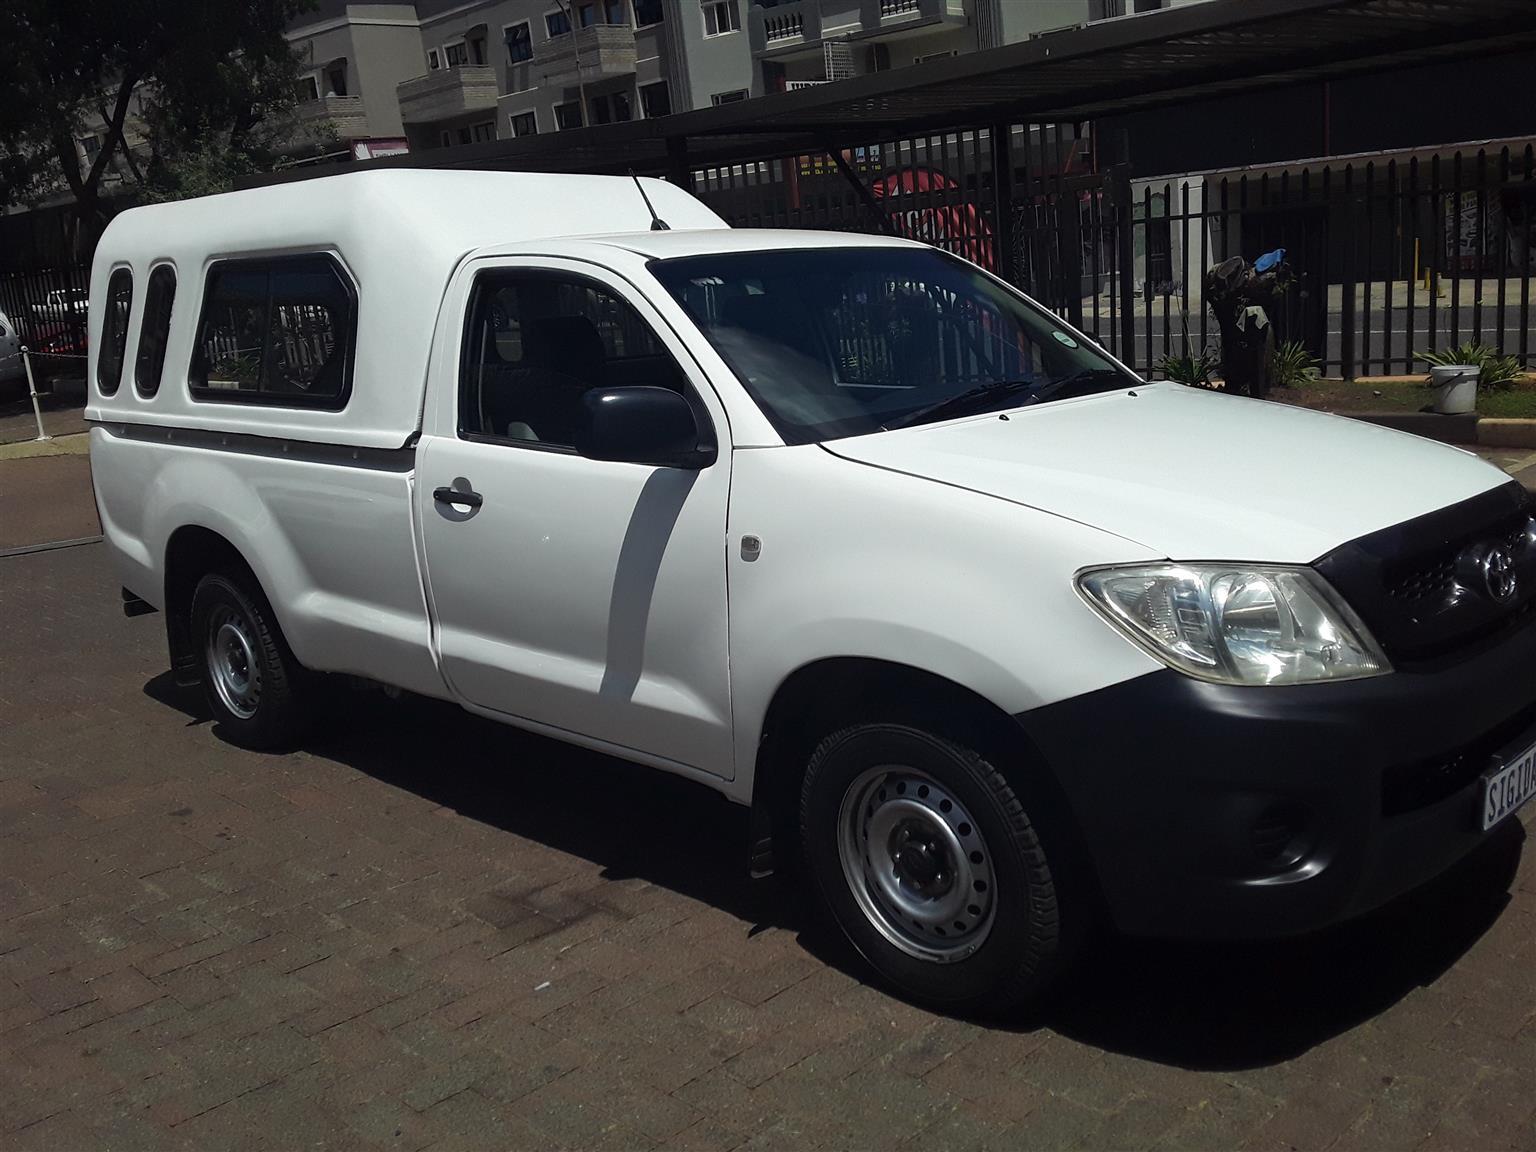 2009 Toyota Hilux single cab HILUX 2.4 GD A/C P/U S/C